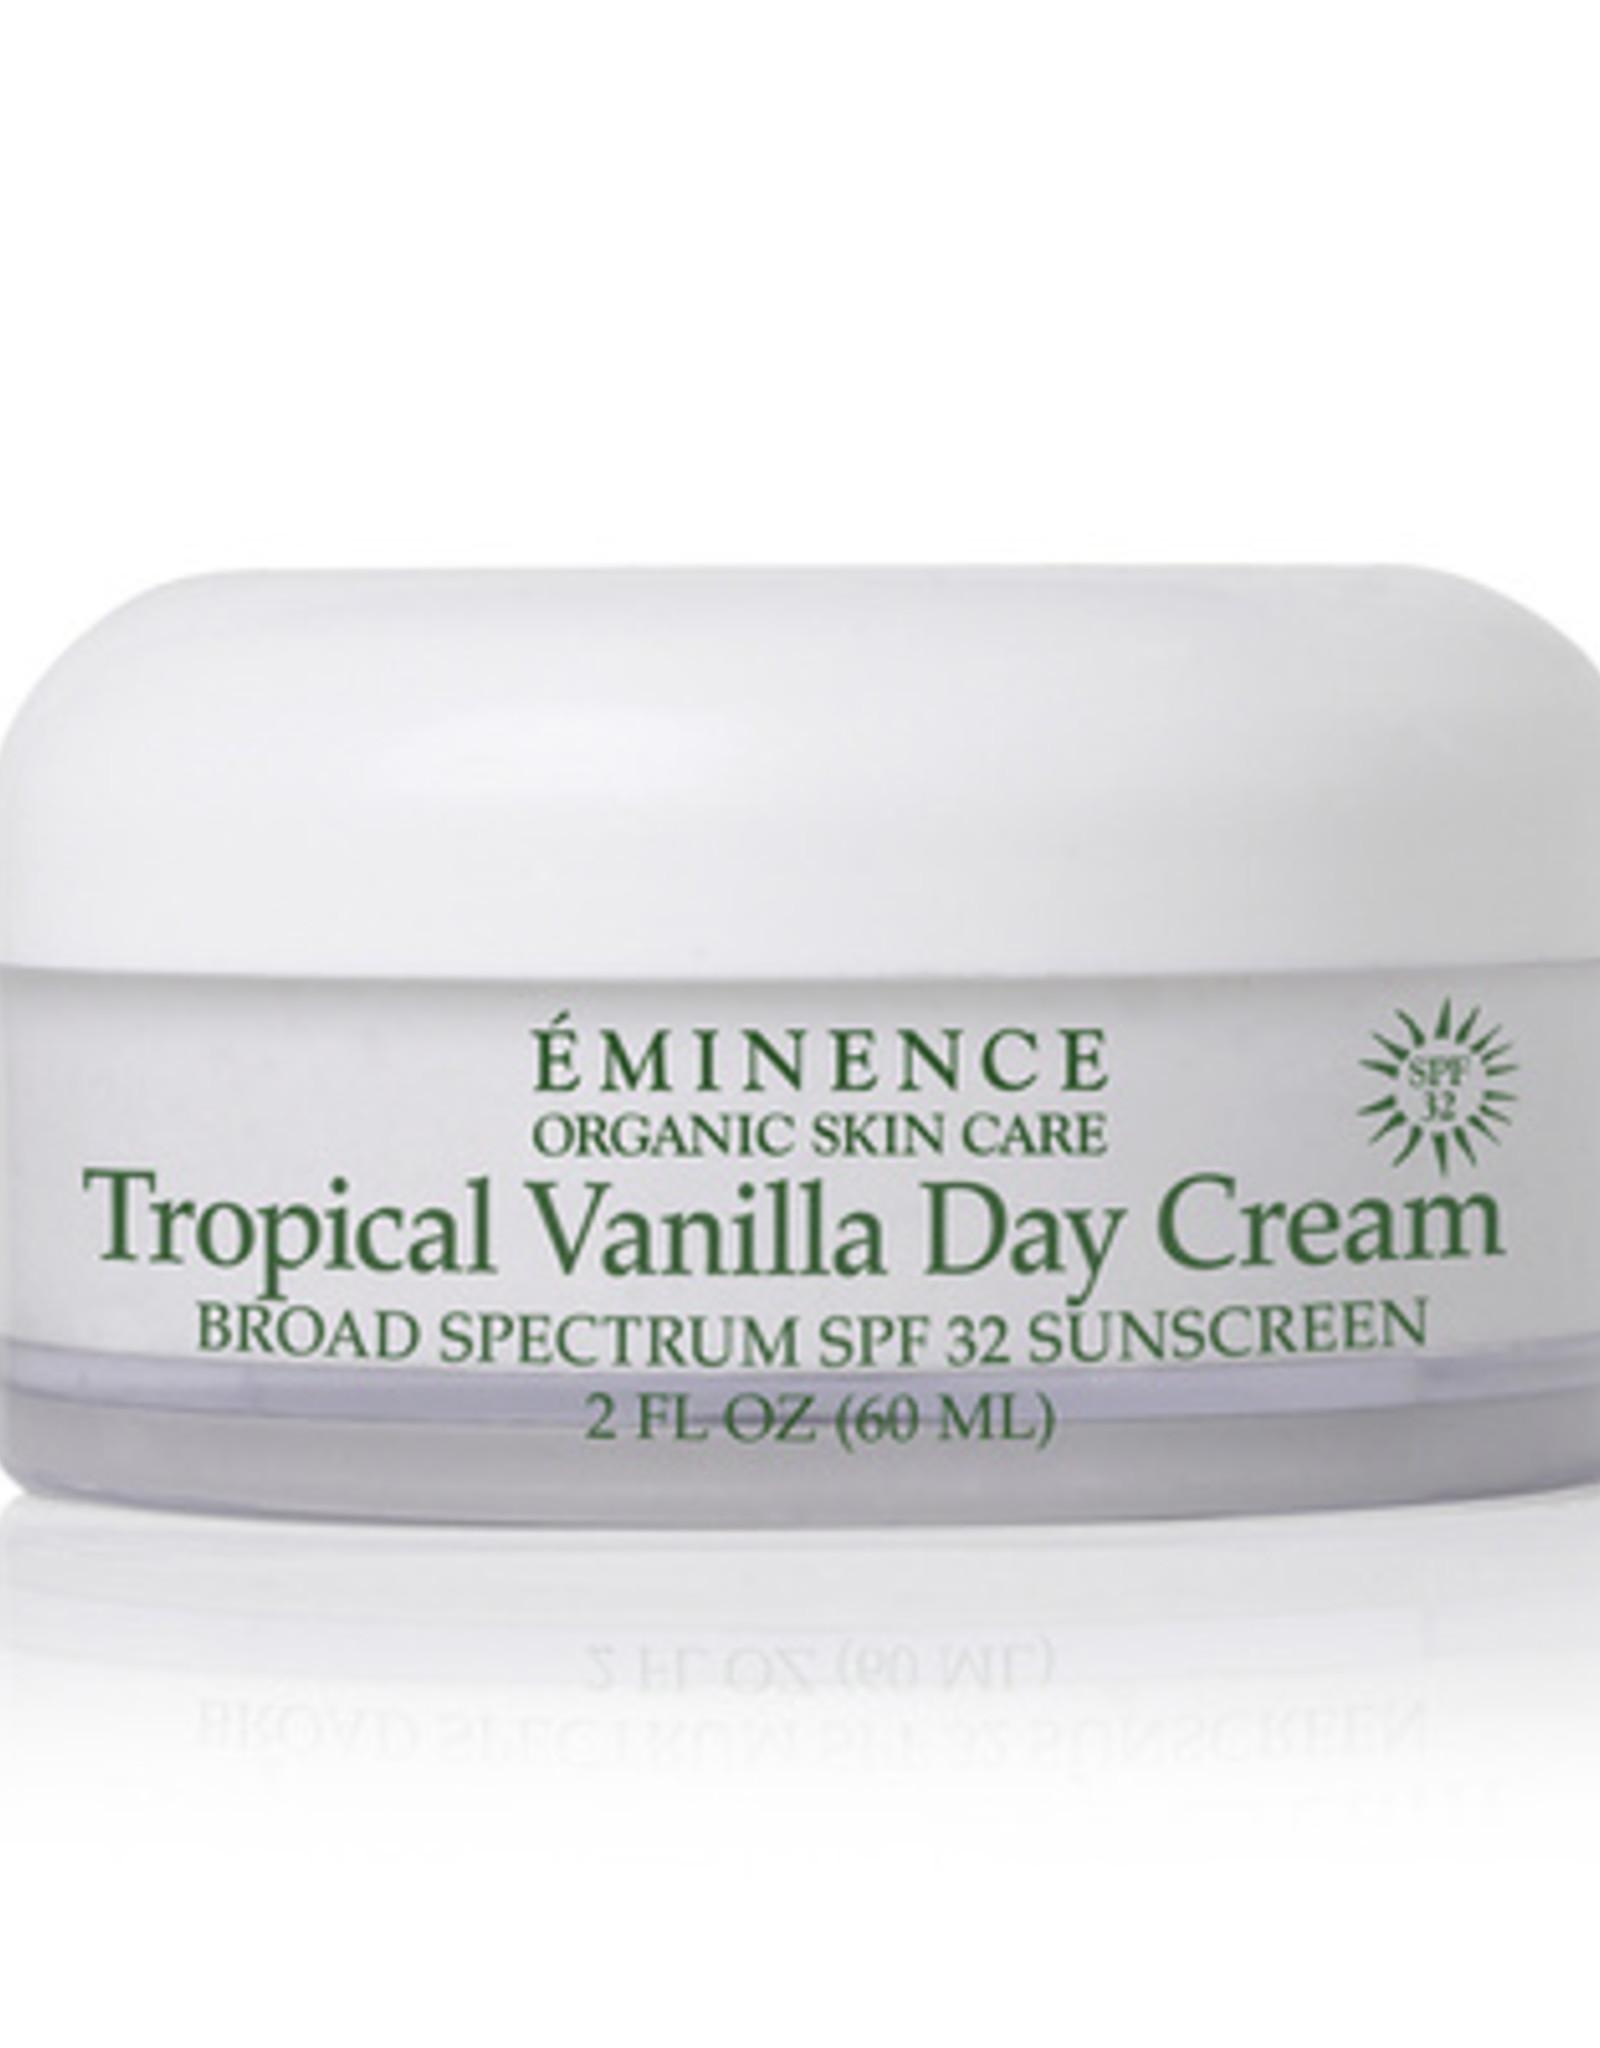 Eminence Organic Skin Care Tropical Vanilla Day Cream SPF 32